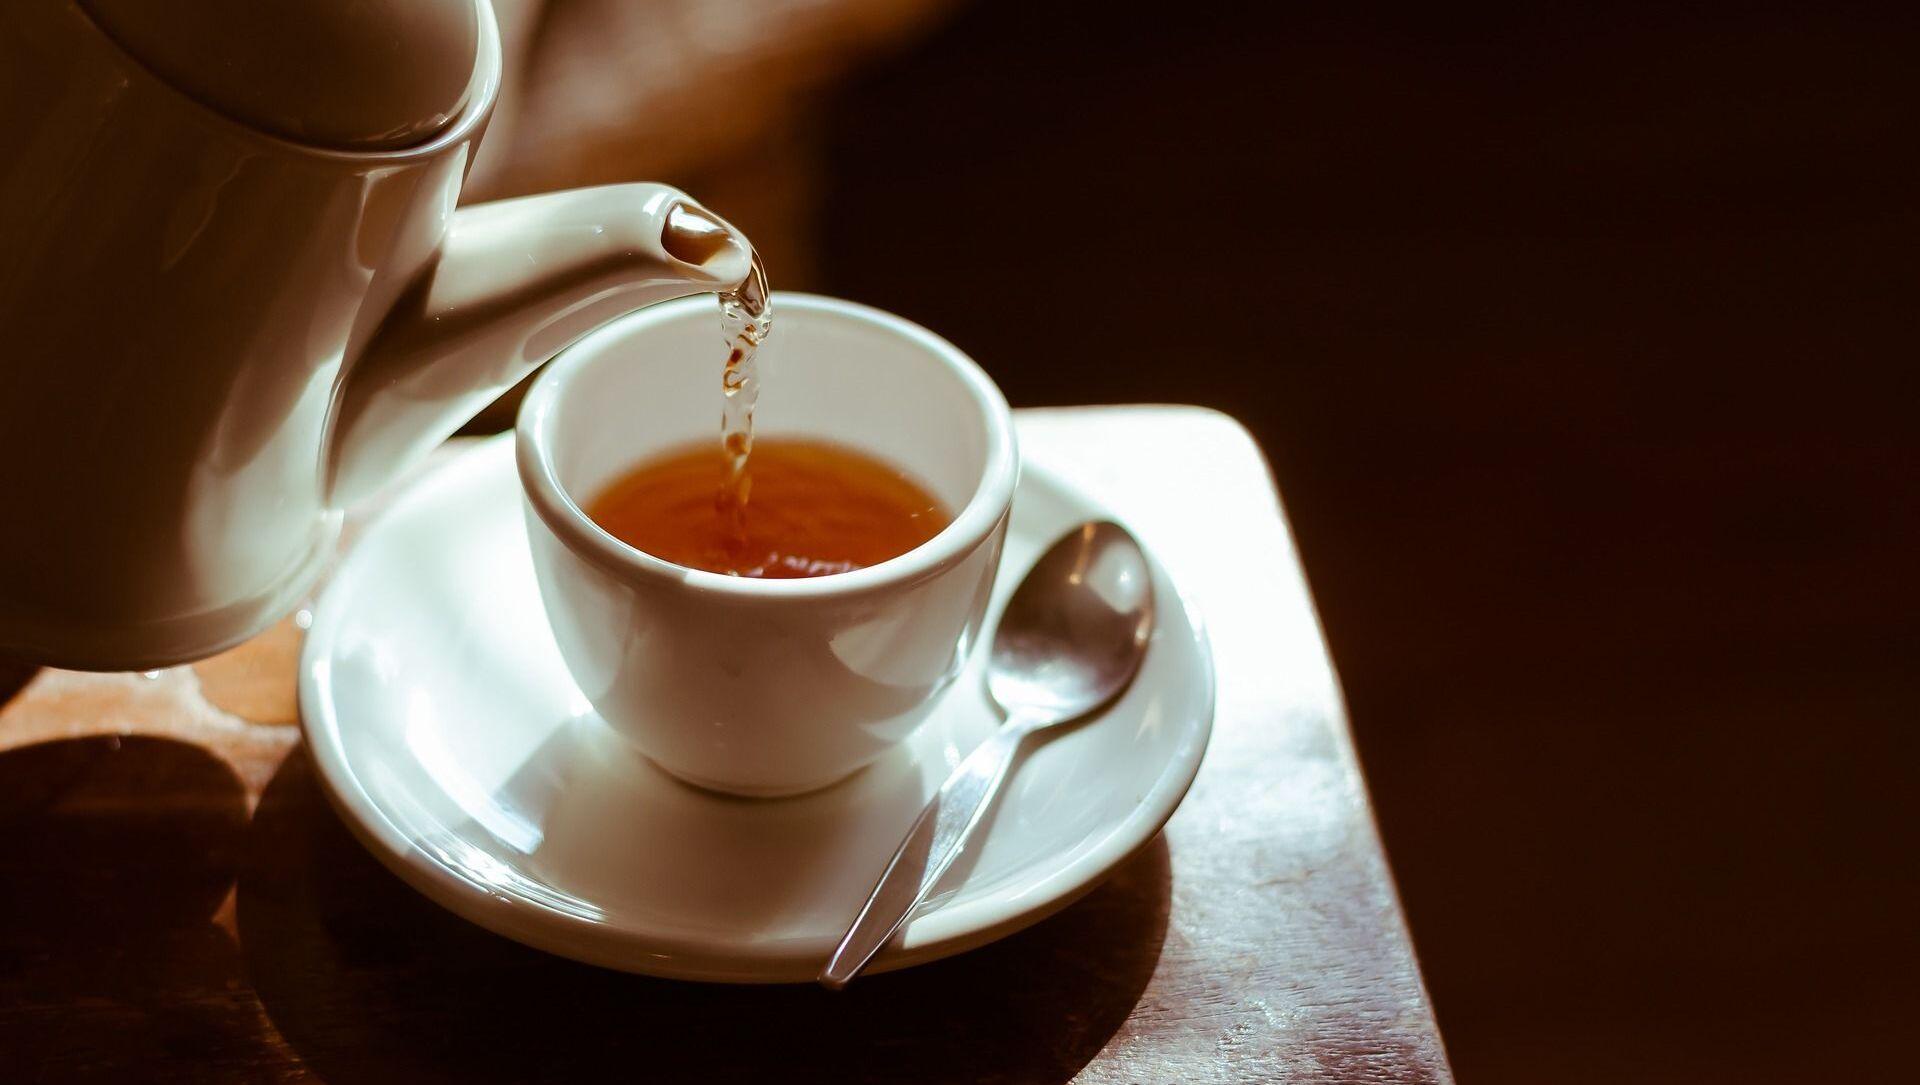 tazza di tè - Sputnik Italia, 1920, 06.04.2021